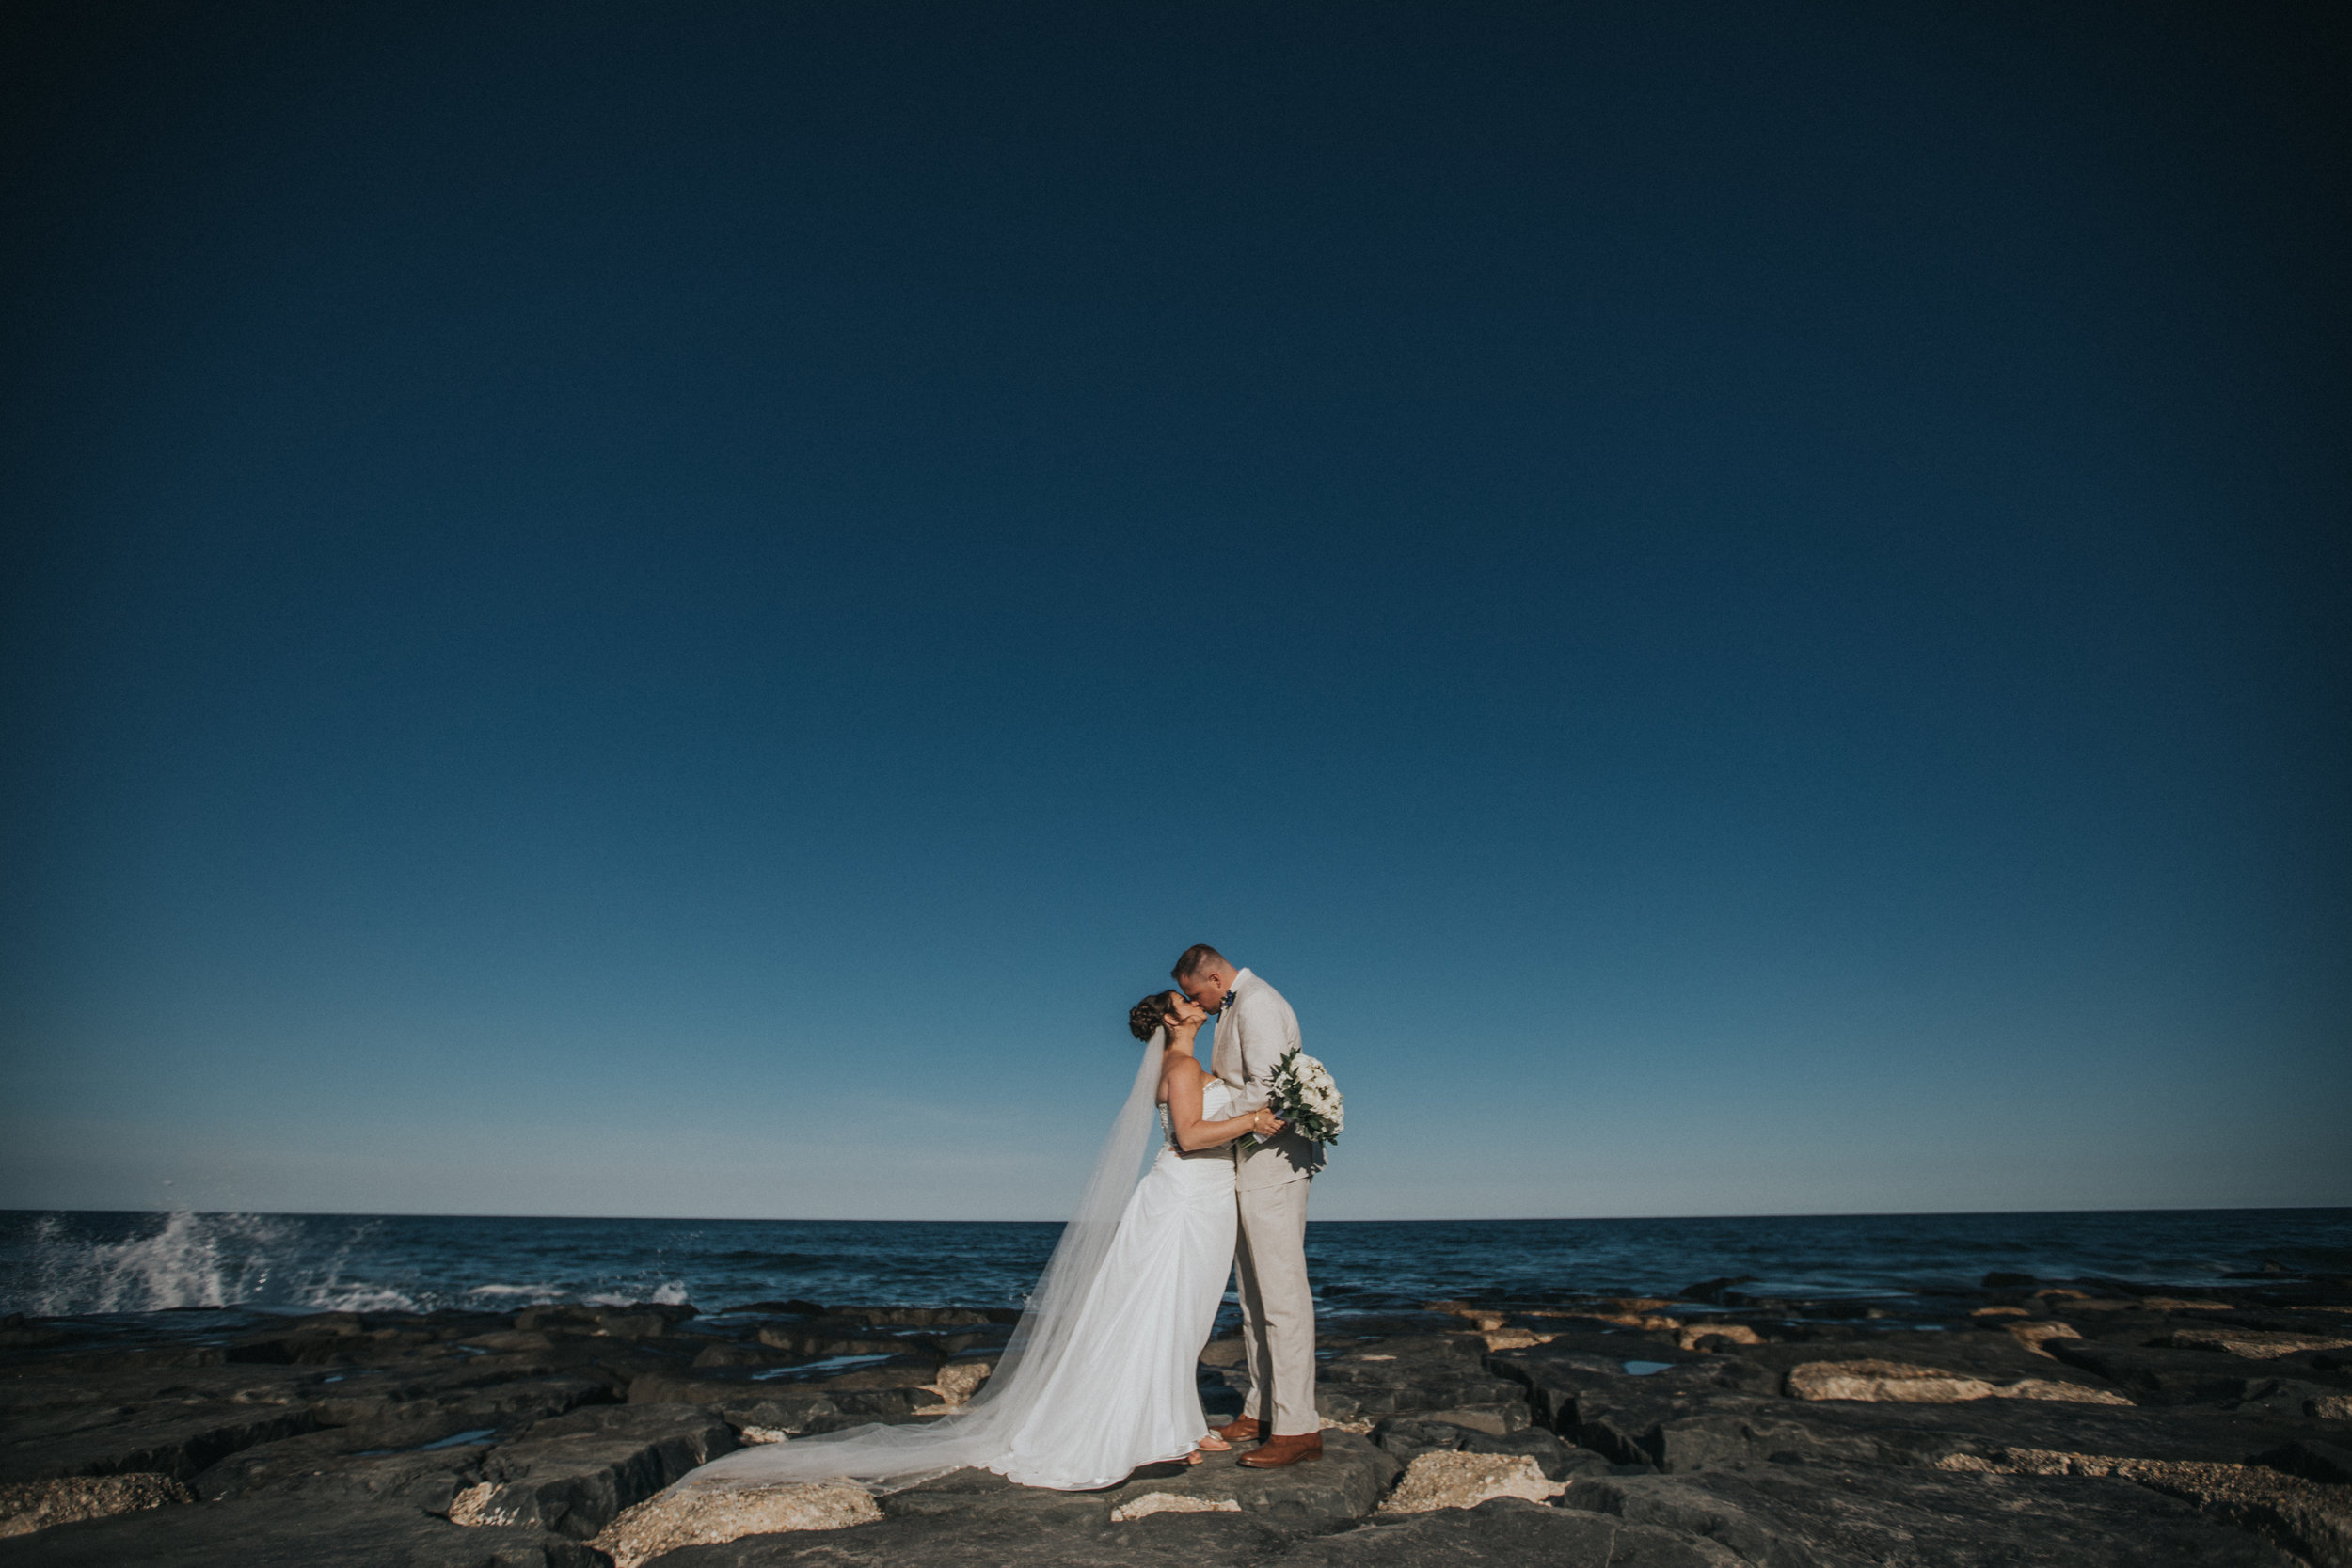 JennaLynnPhotography-NJWeddingPhotographer-Wedding-TheBerkeley-AsburyPark-Allison&Michael-Bride&Groom-80.jpg